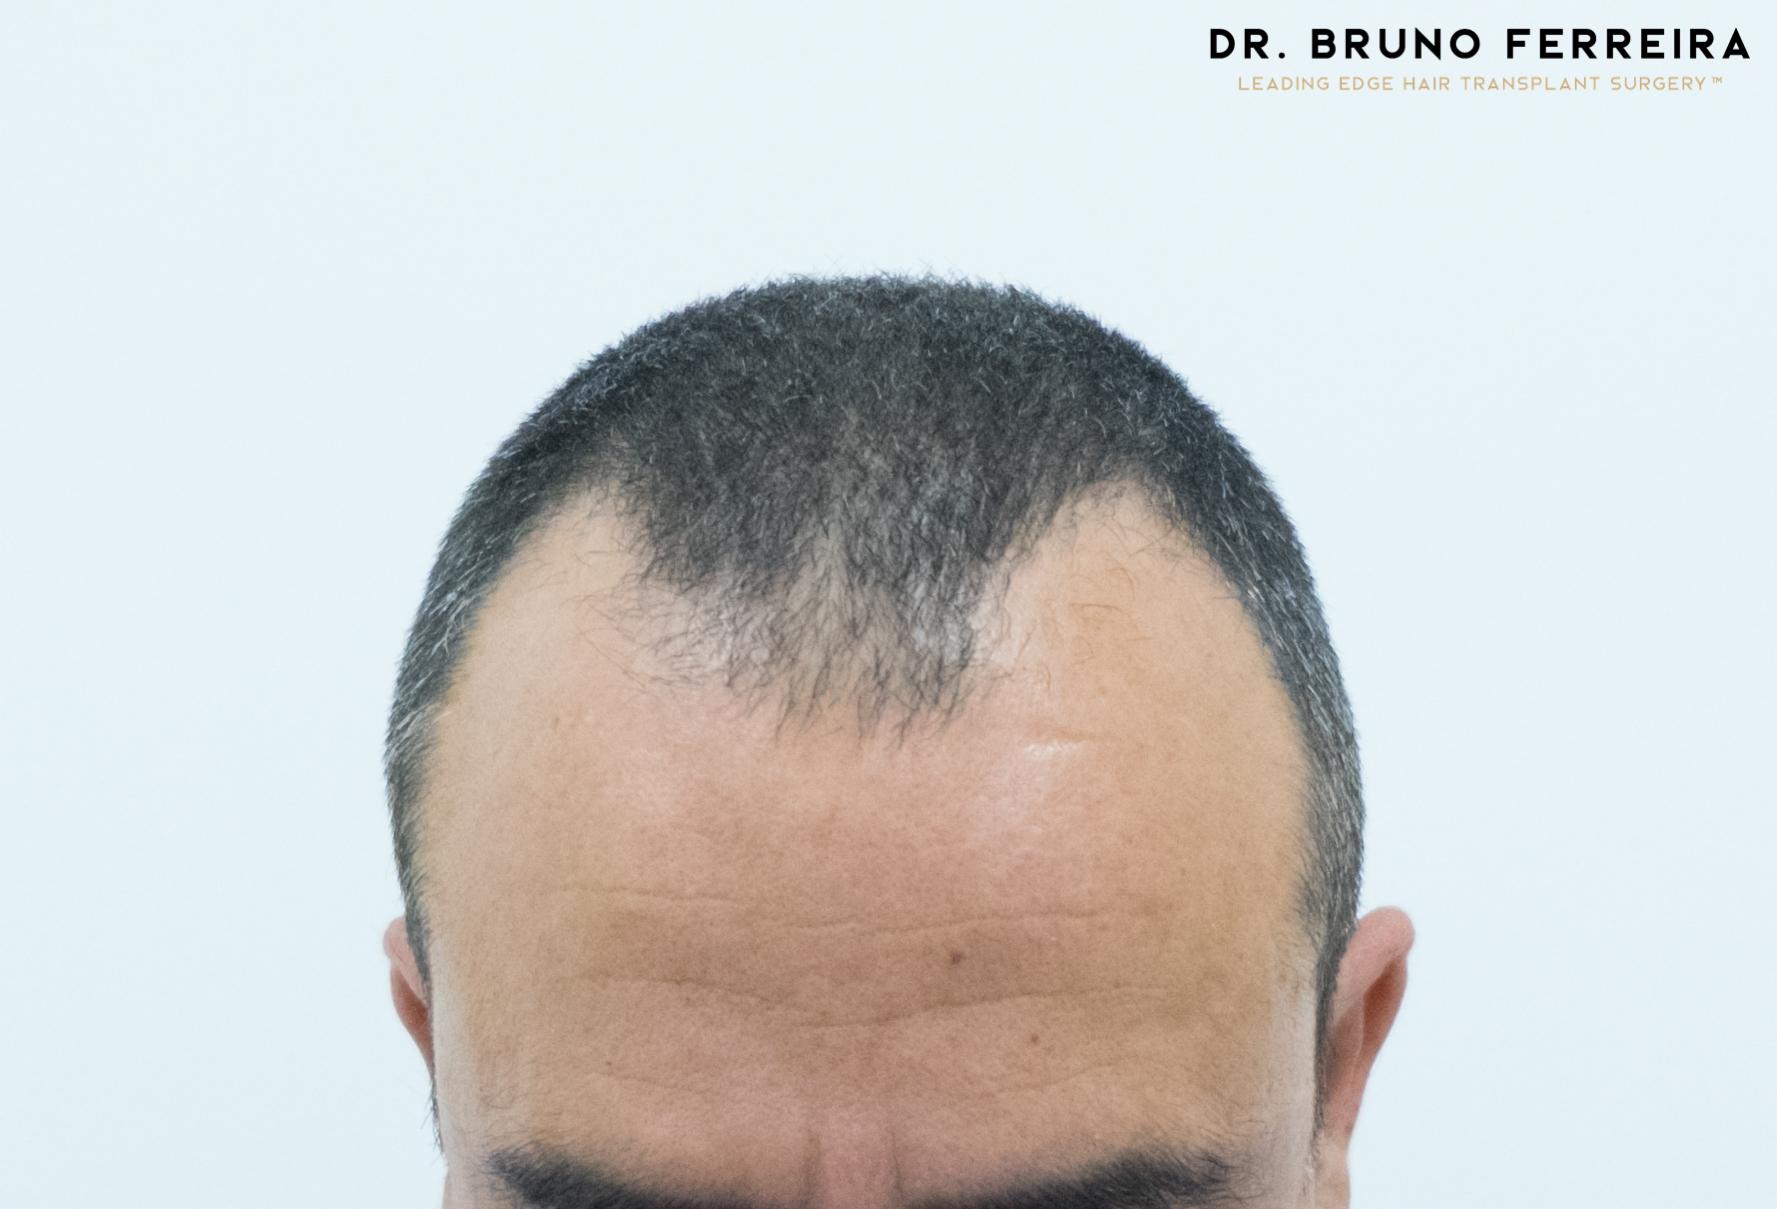 00001 DR. BRUNO FERREIRA (Case 1) - Before - 2.jpg